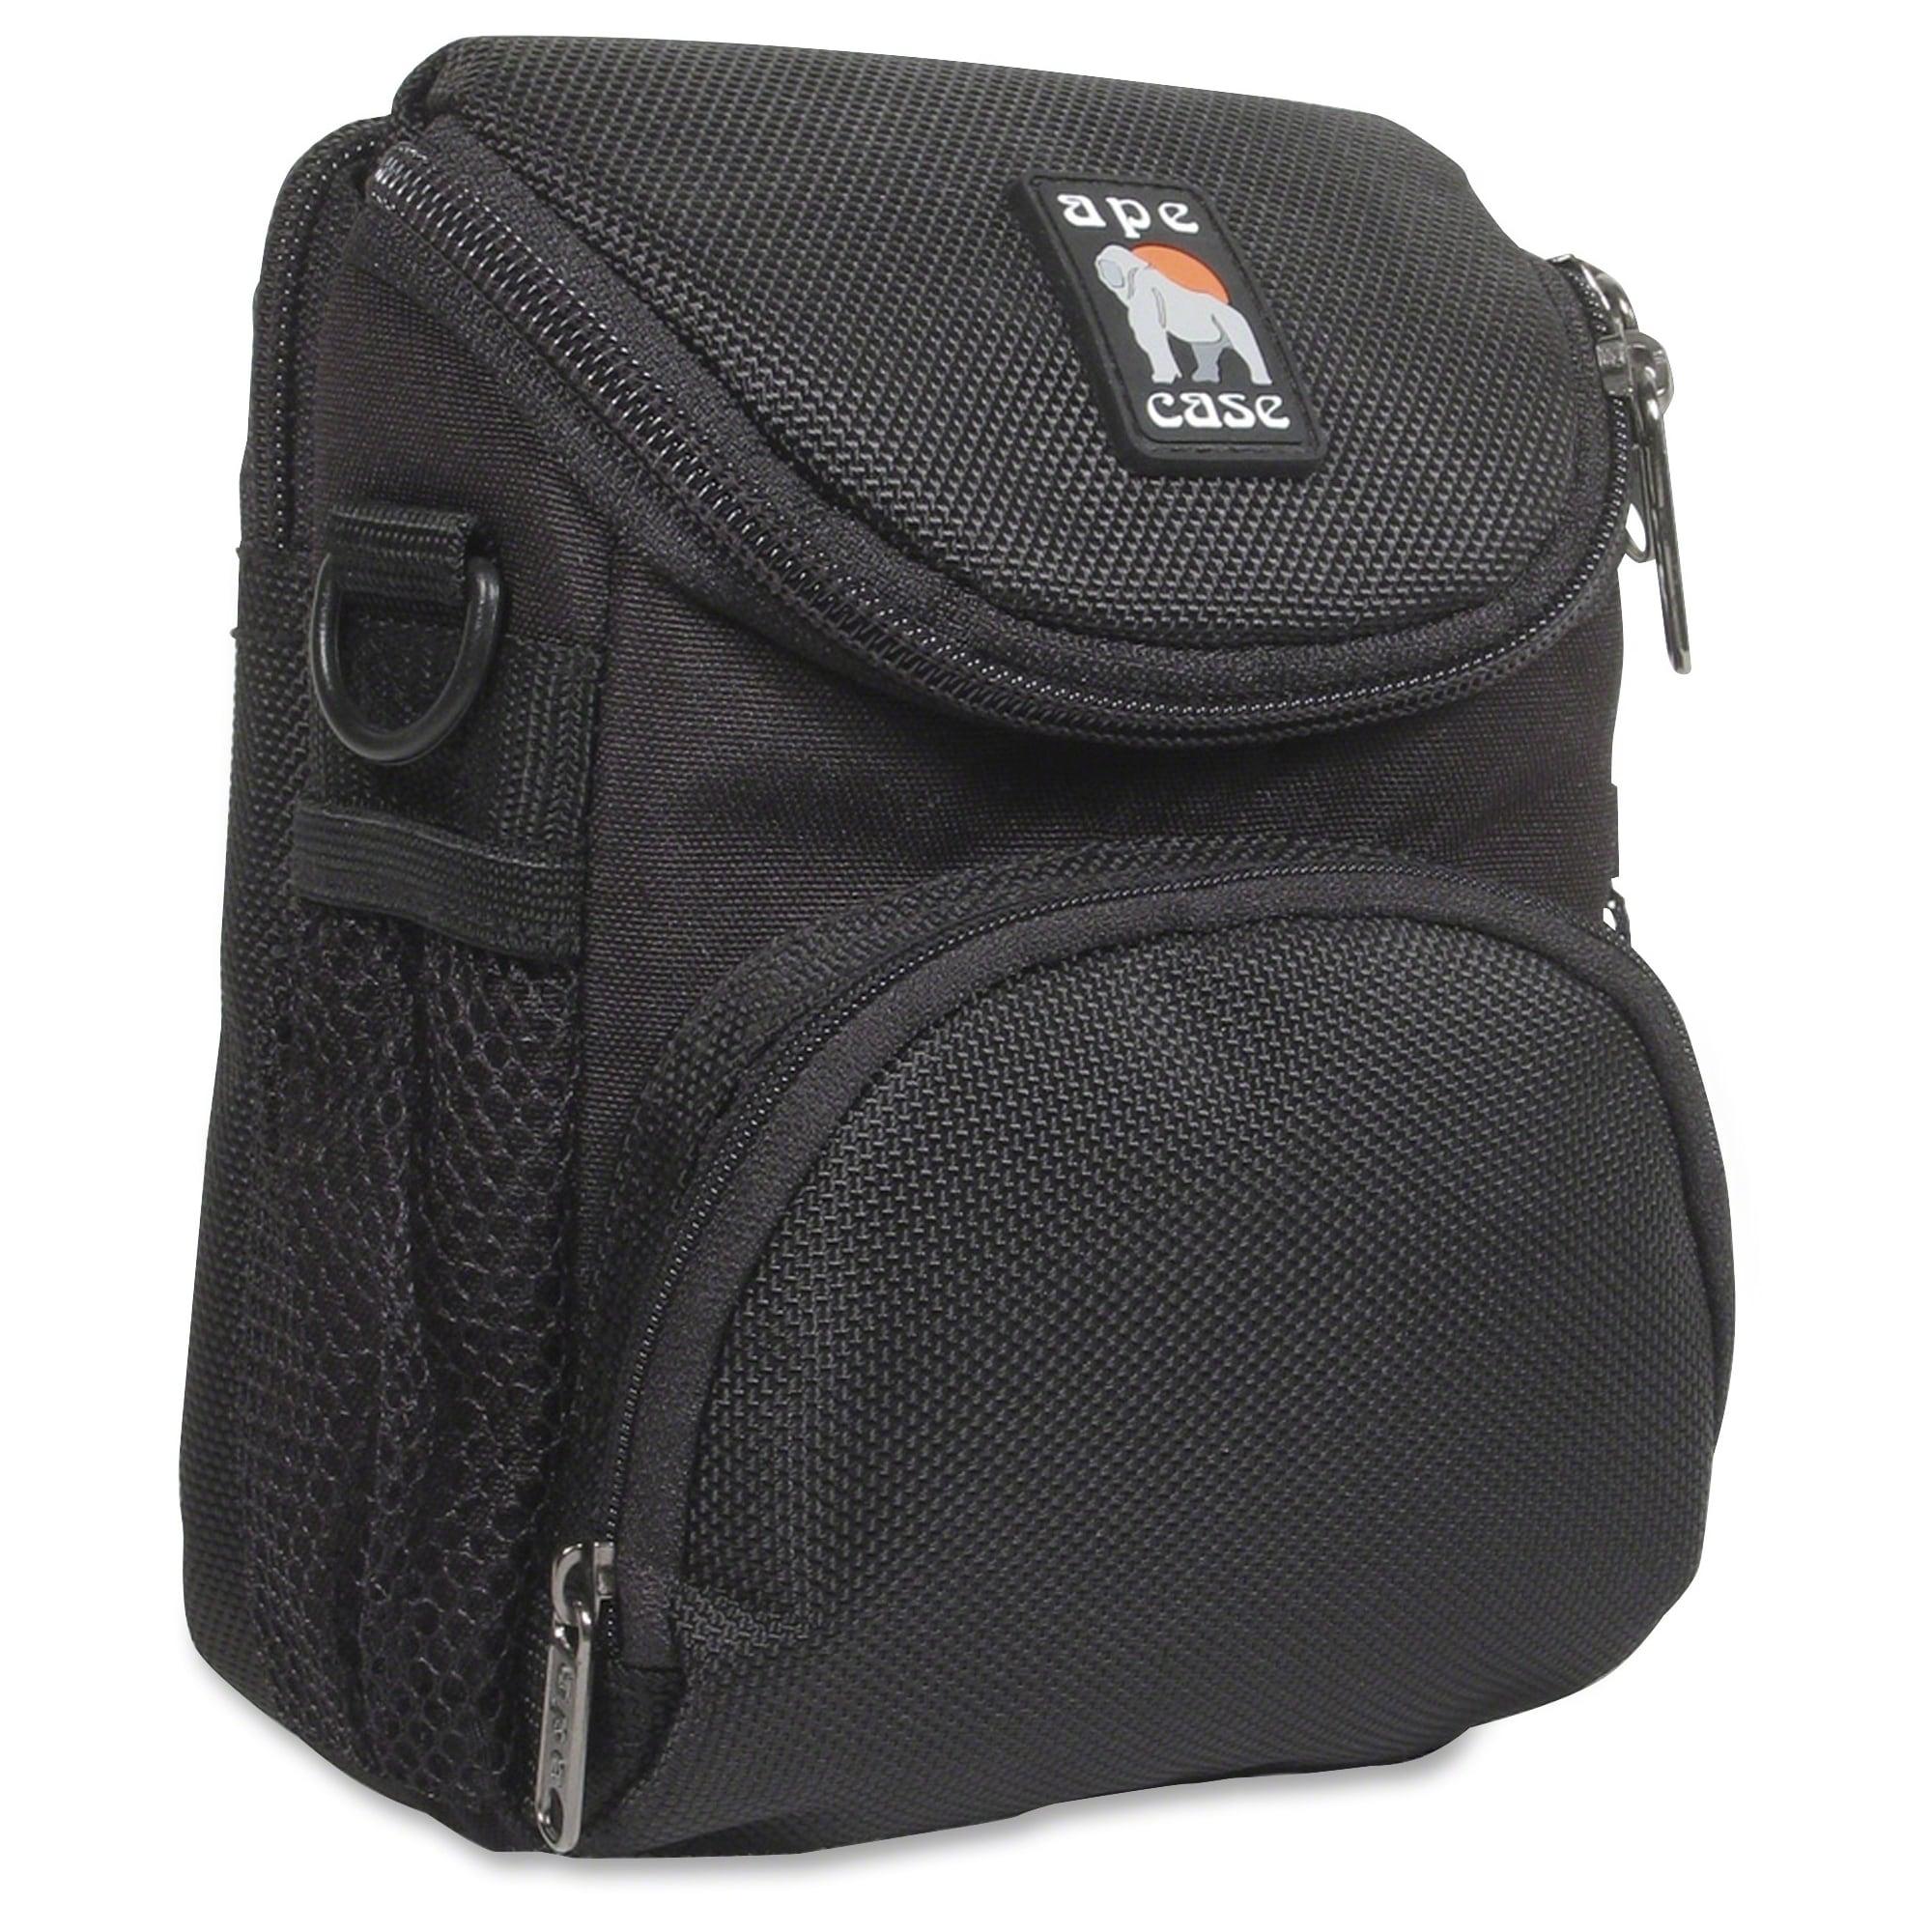 Ape Case AC220 Camcorder/Digital Camera Case, Black